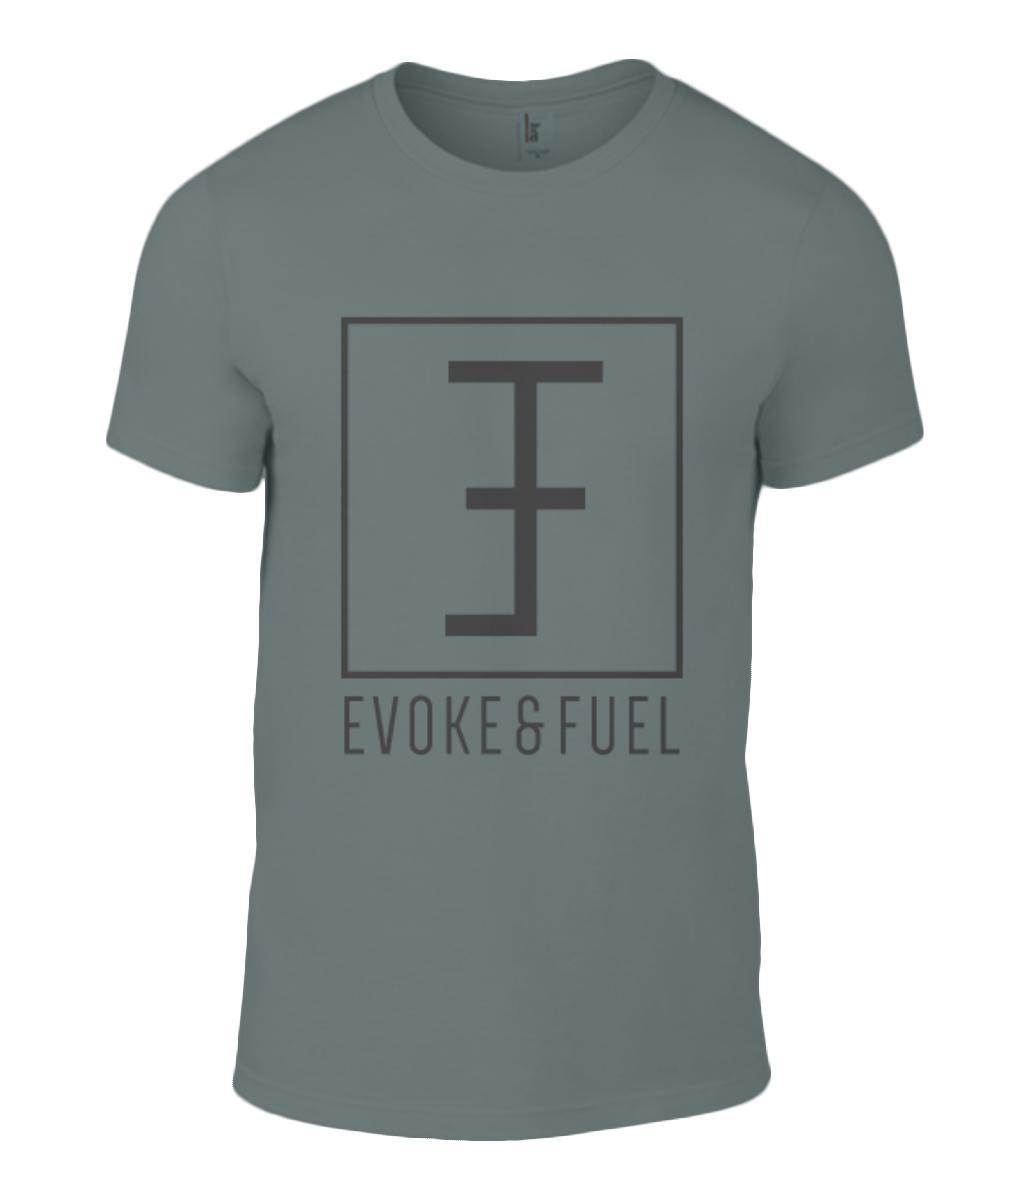 New in Evoke & Fuel Mens..., make sure to come check us out! http://evokeandfuel.com/products/anvil-fashion-basic-t-shirt-e-f?utm_campaign=social_autopilot&utm_source=pin&utm_medium=pin